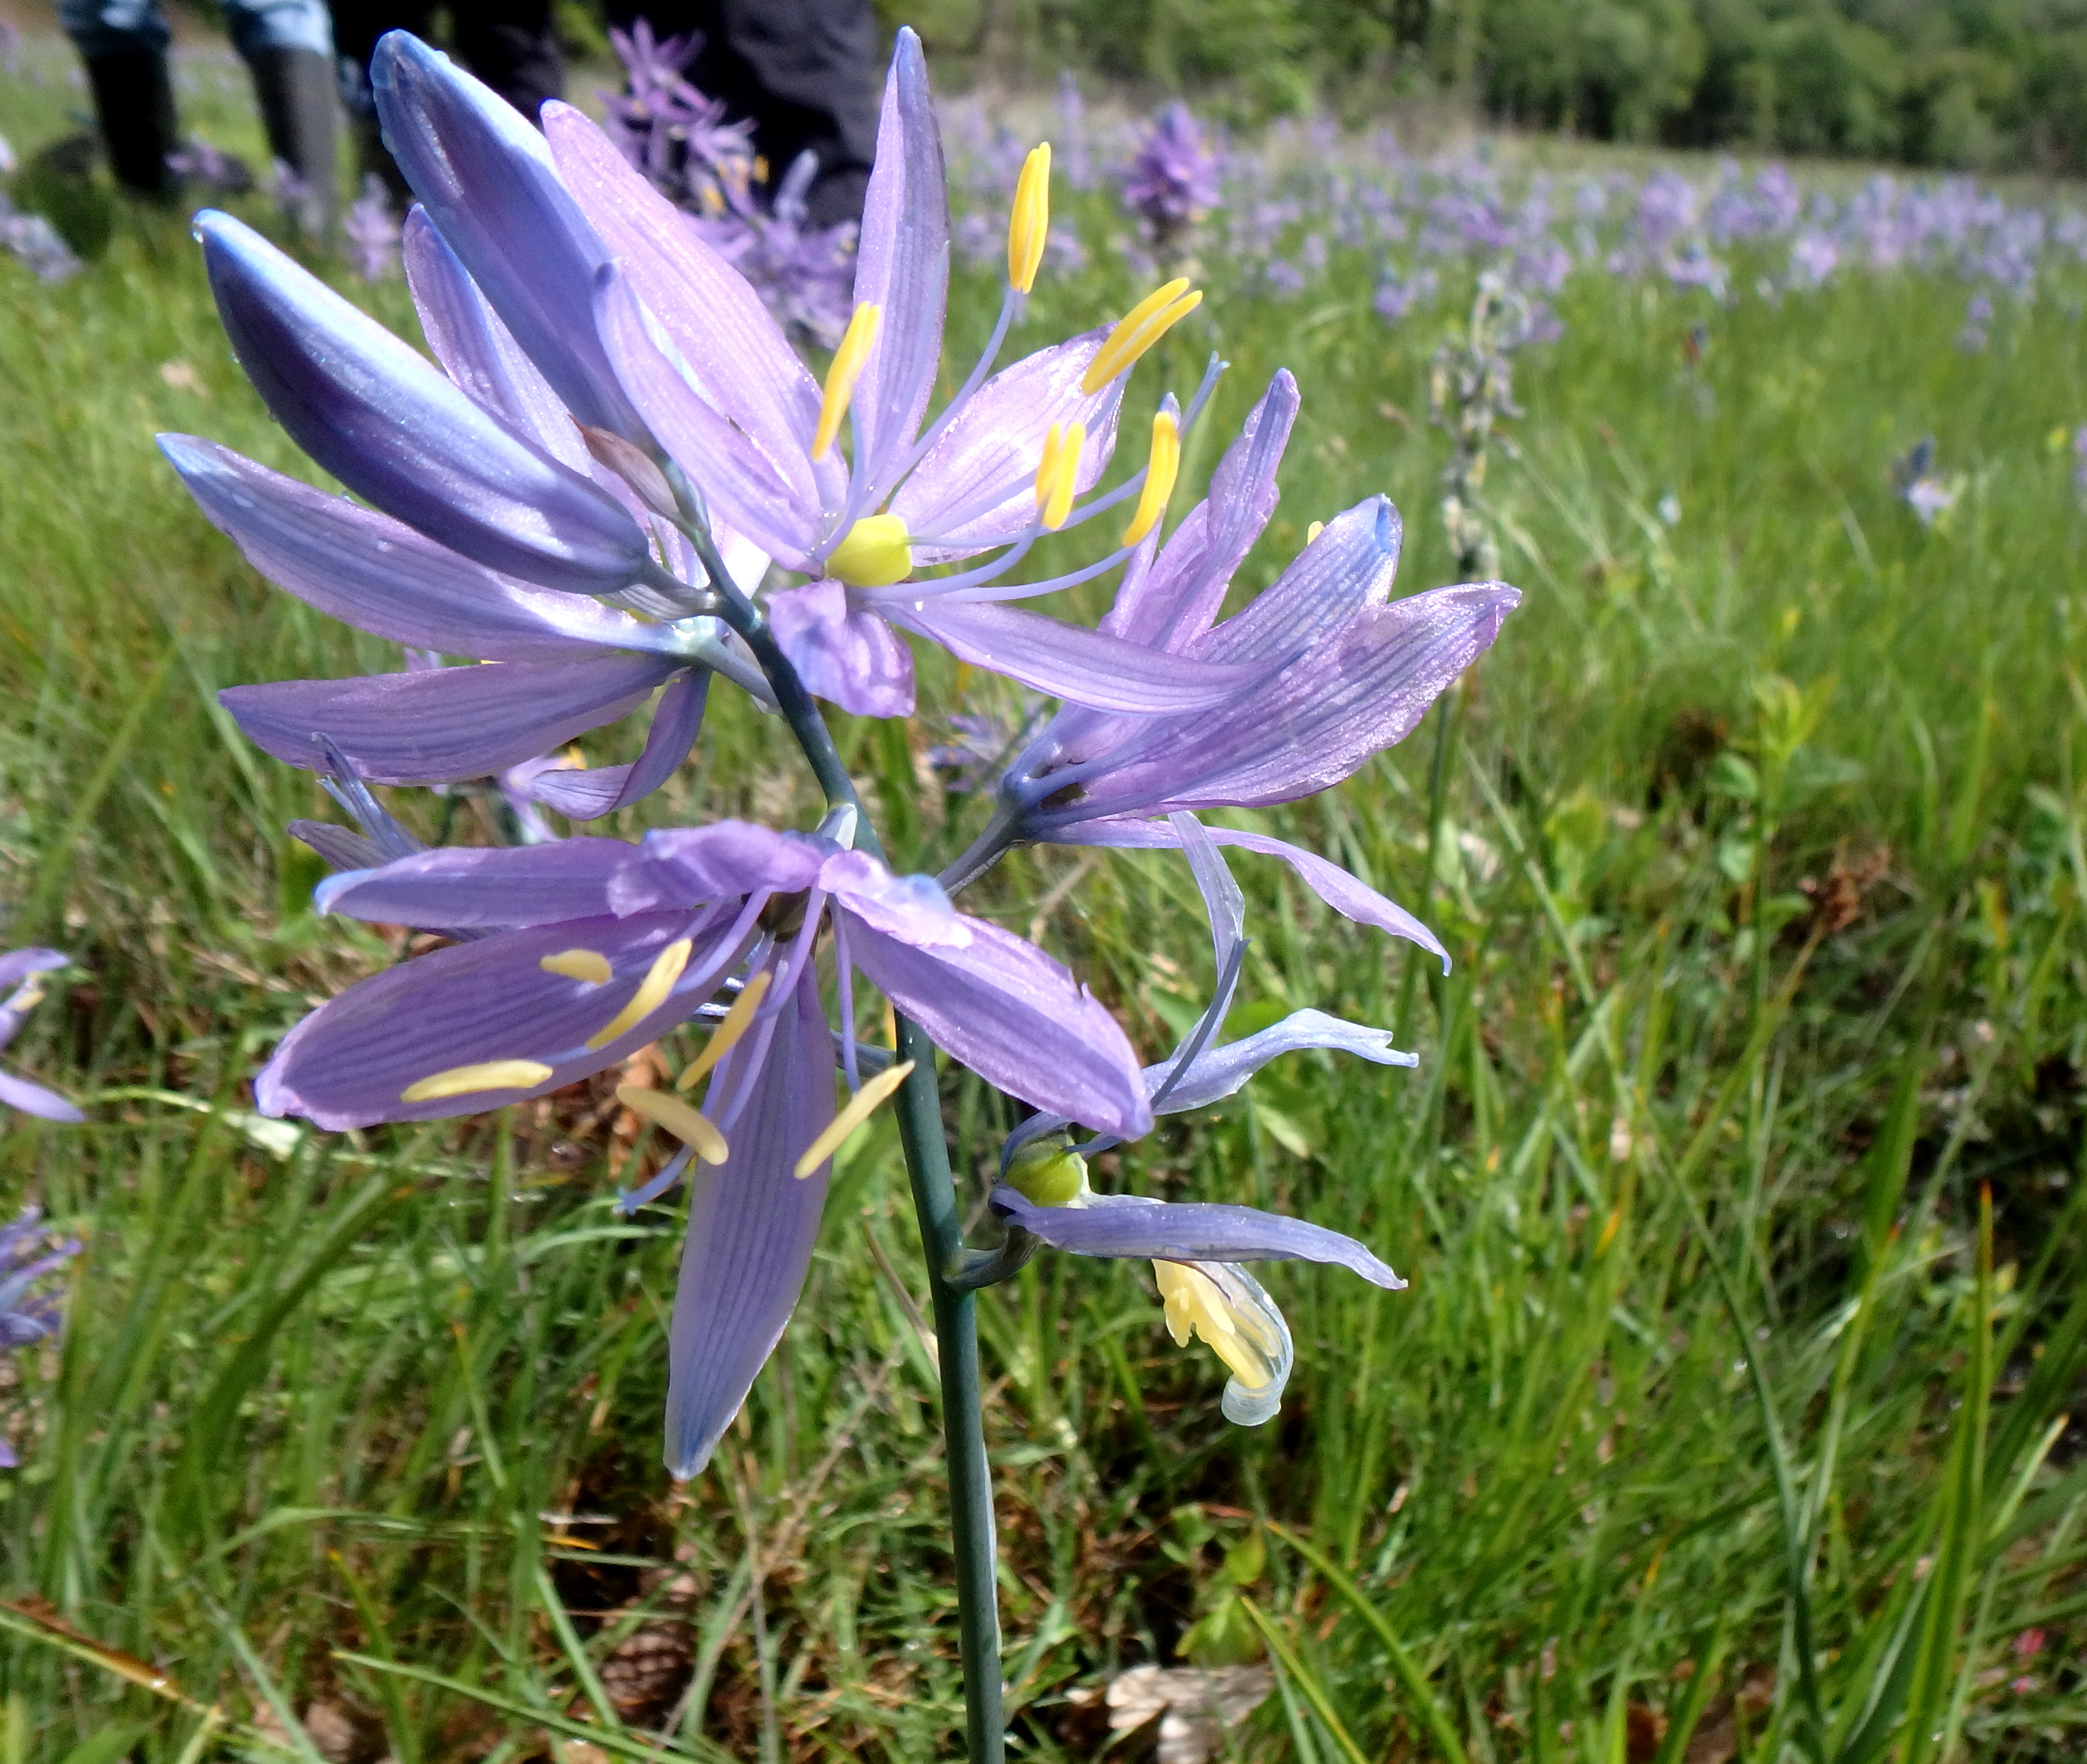 Camas flower